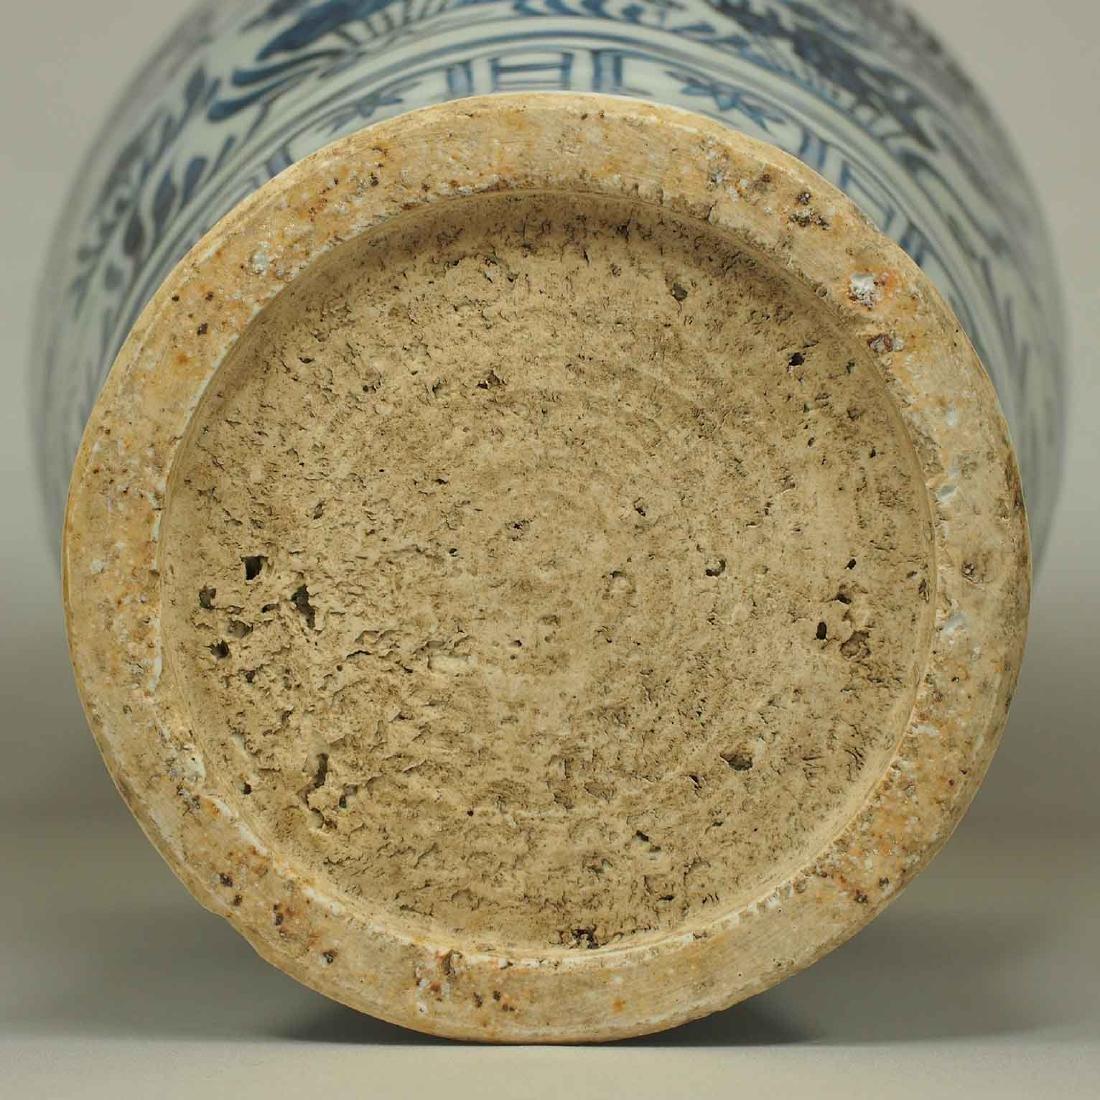 Lion-Head Handled Vase with Mandarin Ducks, early Ming - 10